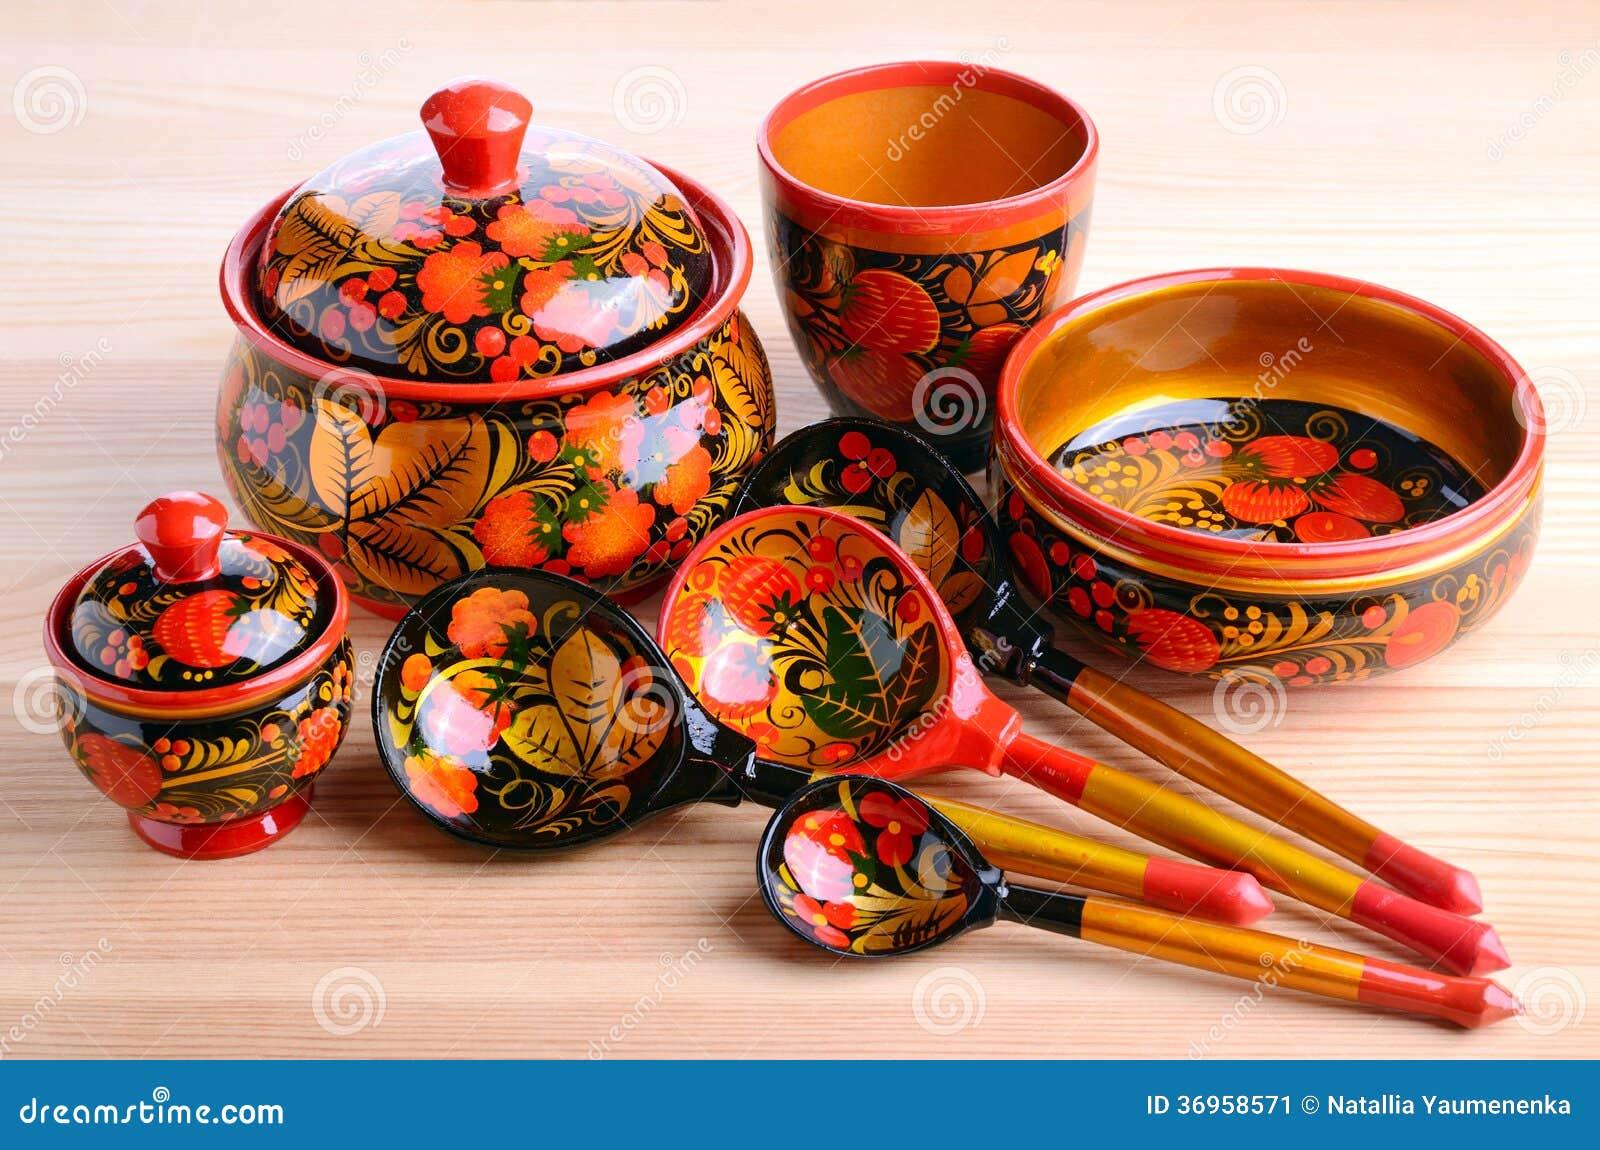 ustensiles russes de cuisine de khokhloma image stock image du nourriture groupe 36958571. Black Bedroom Furniture Sets. Home Design Ideas